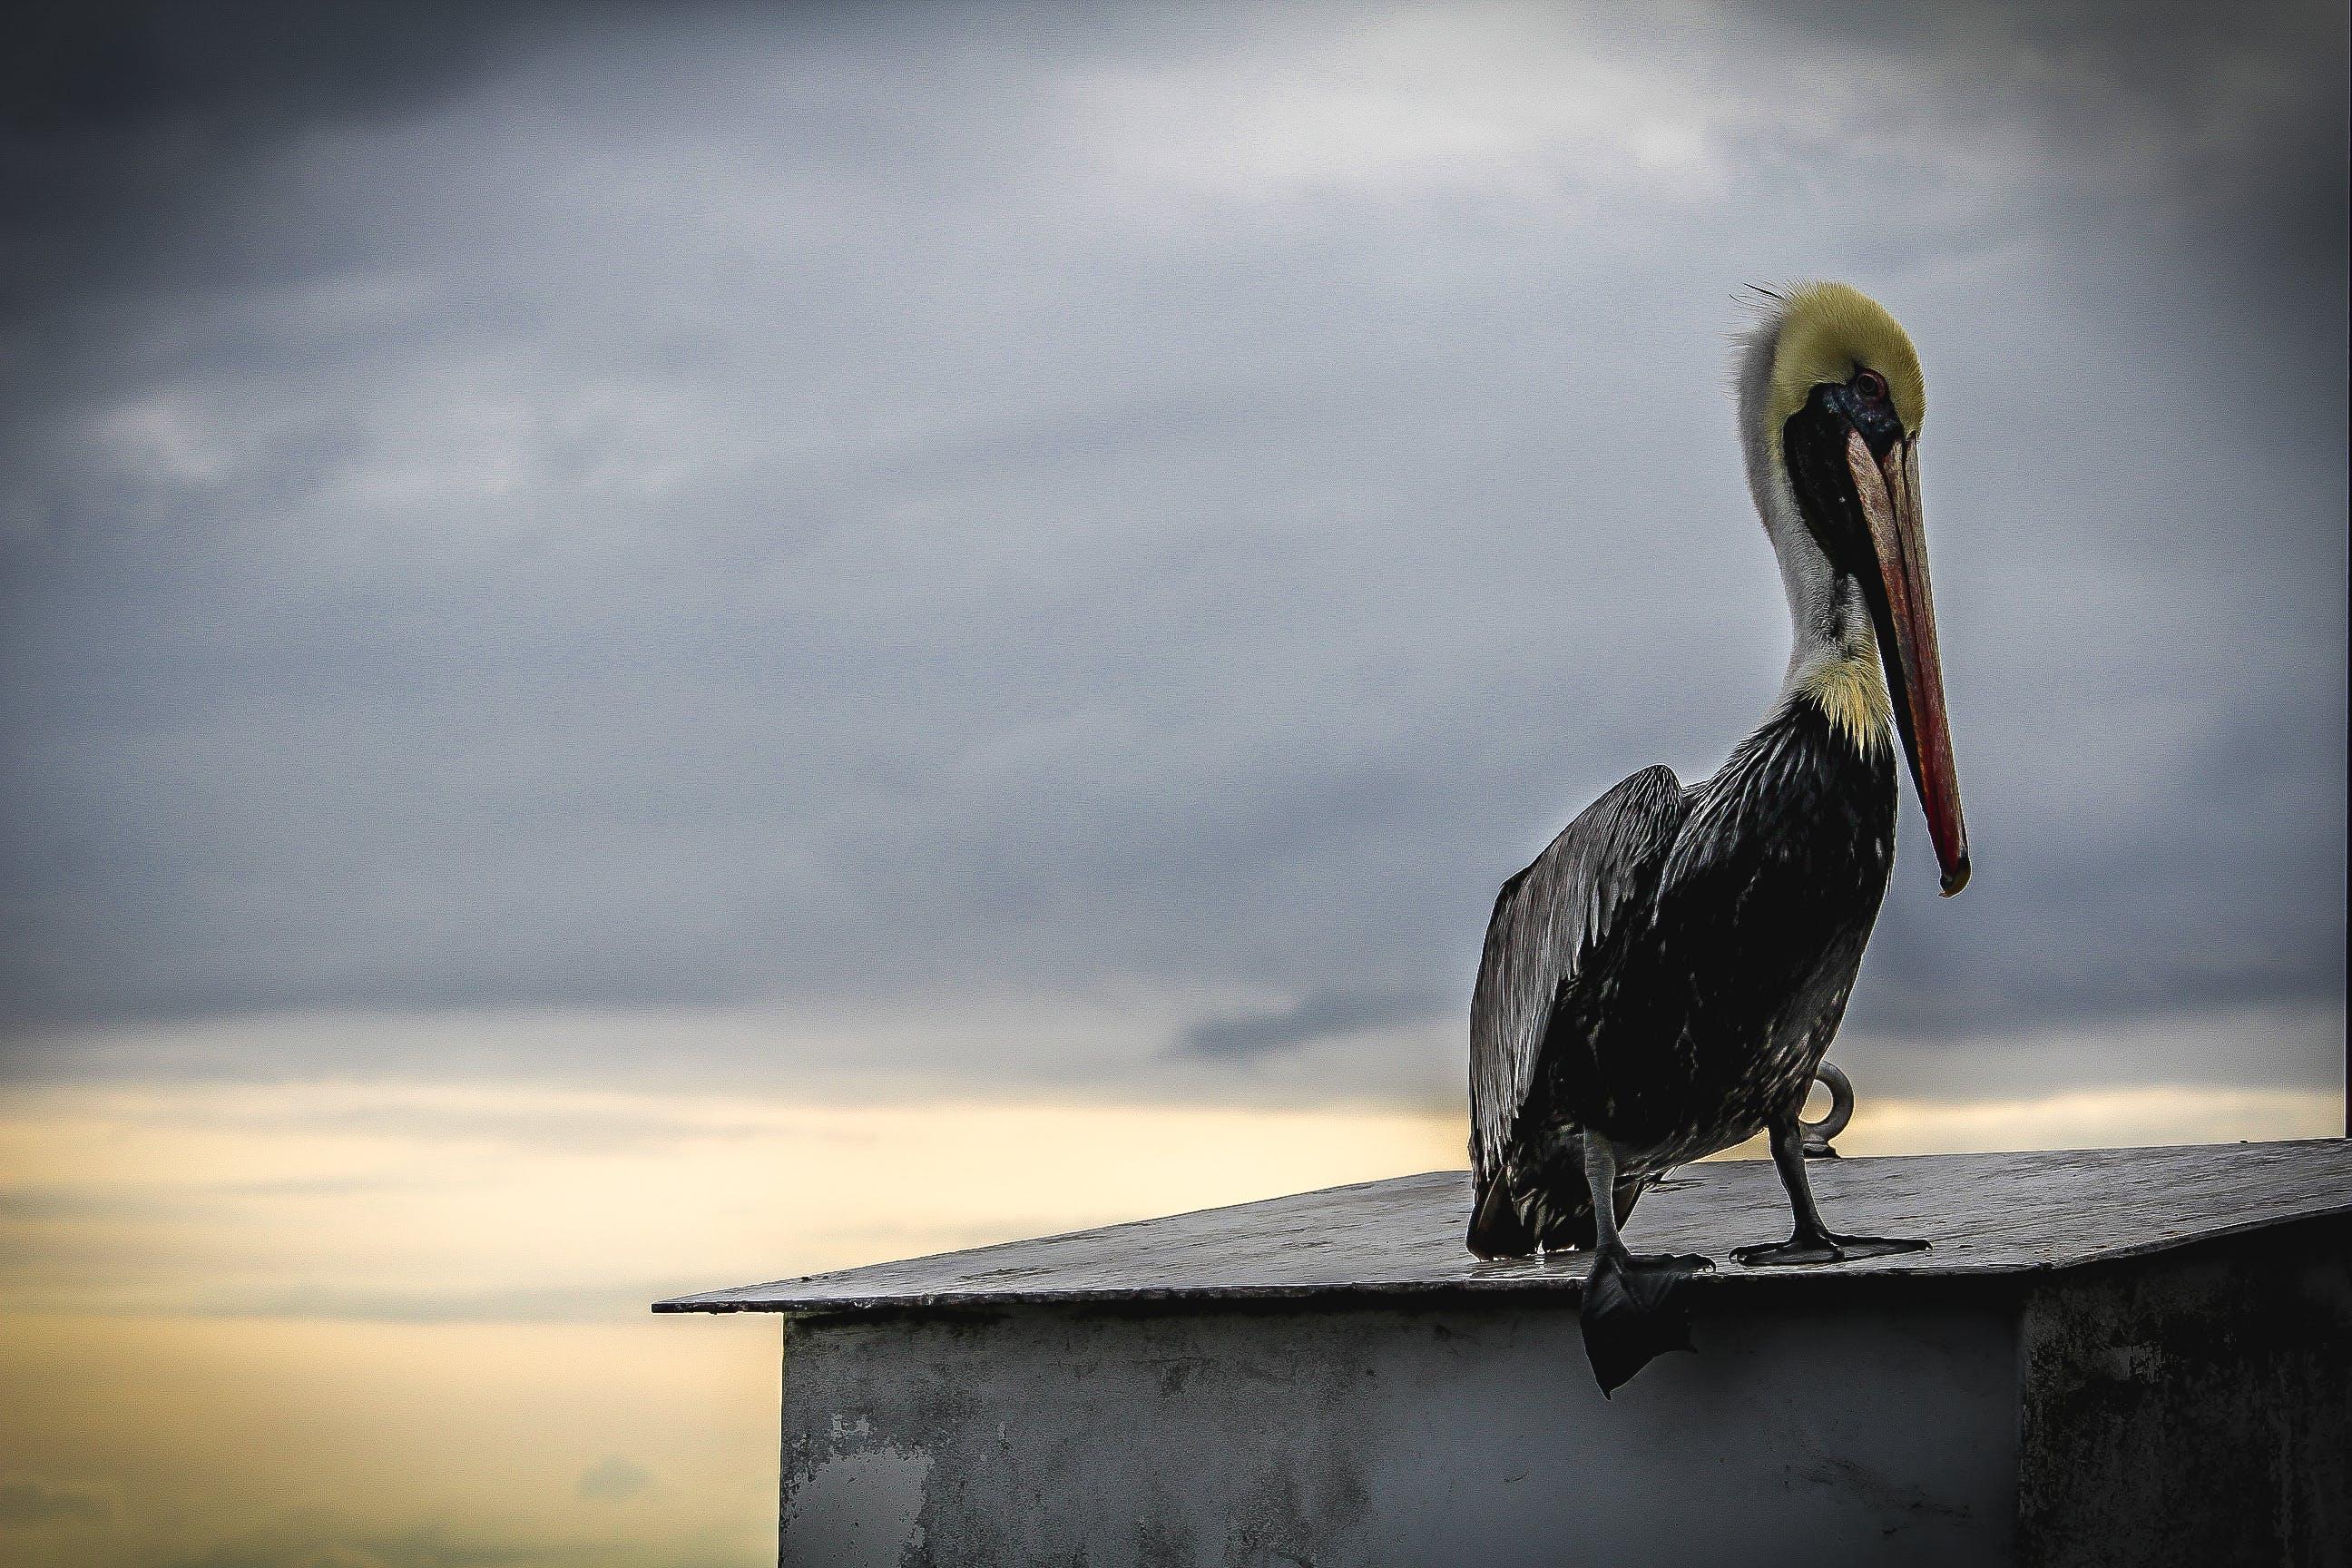 Black Pelican Photo